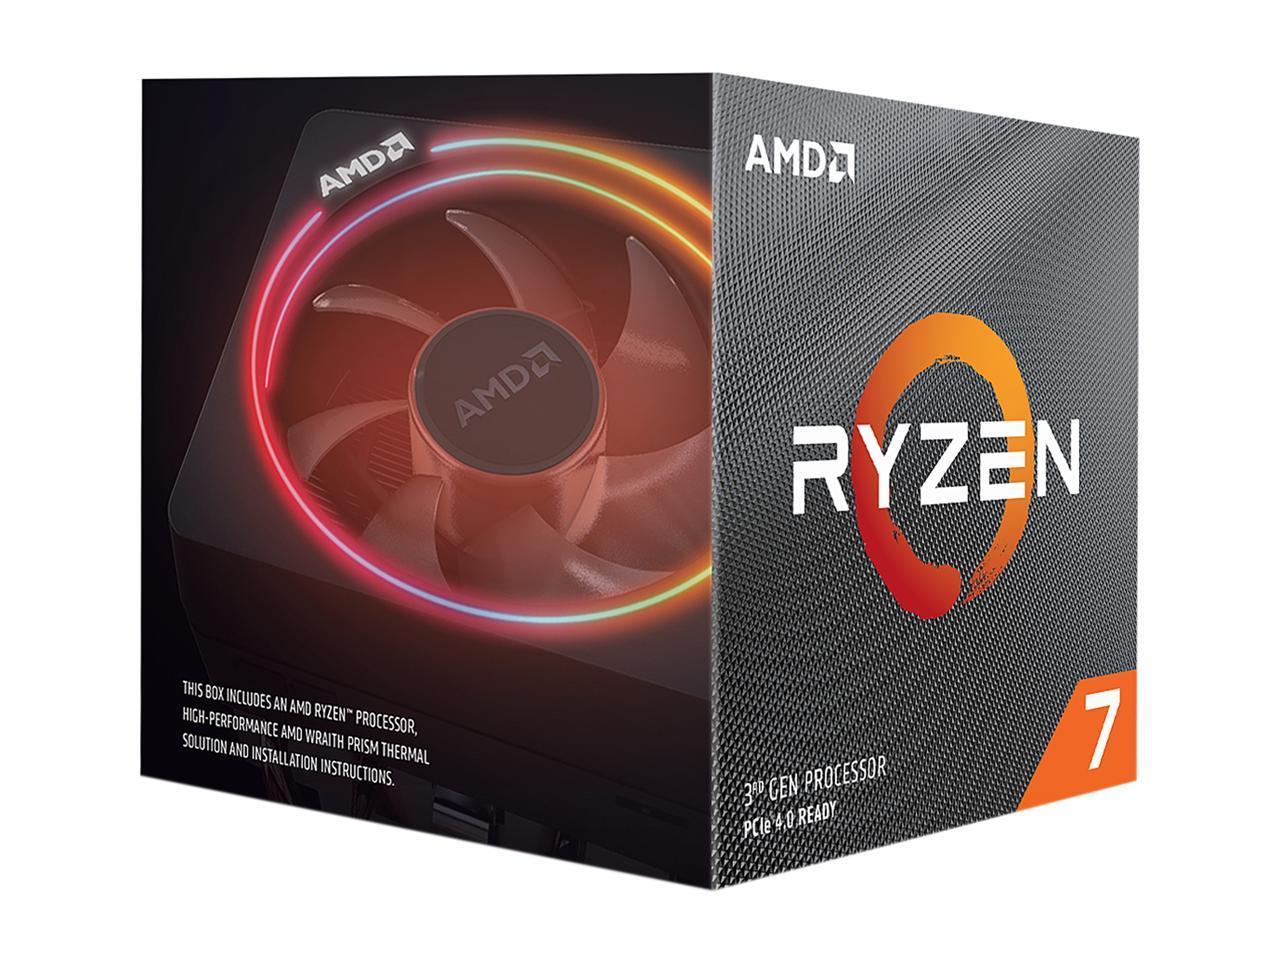 AMD RYZEN 7 3700X 8-Core 3.6 GHz (4.4 GHz Max Boost) 65W Desktop Processor $264.99